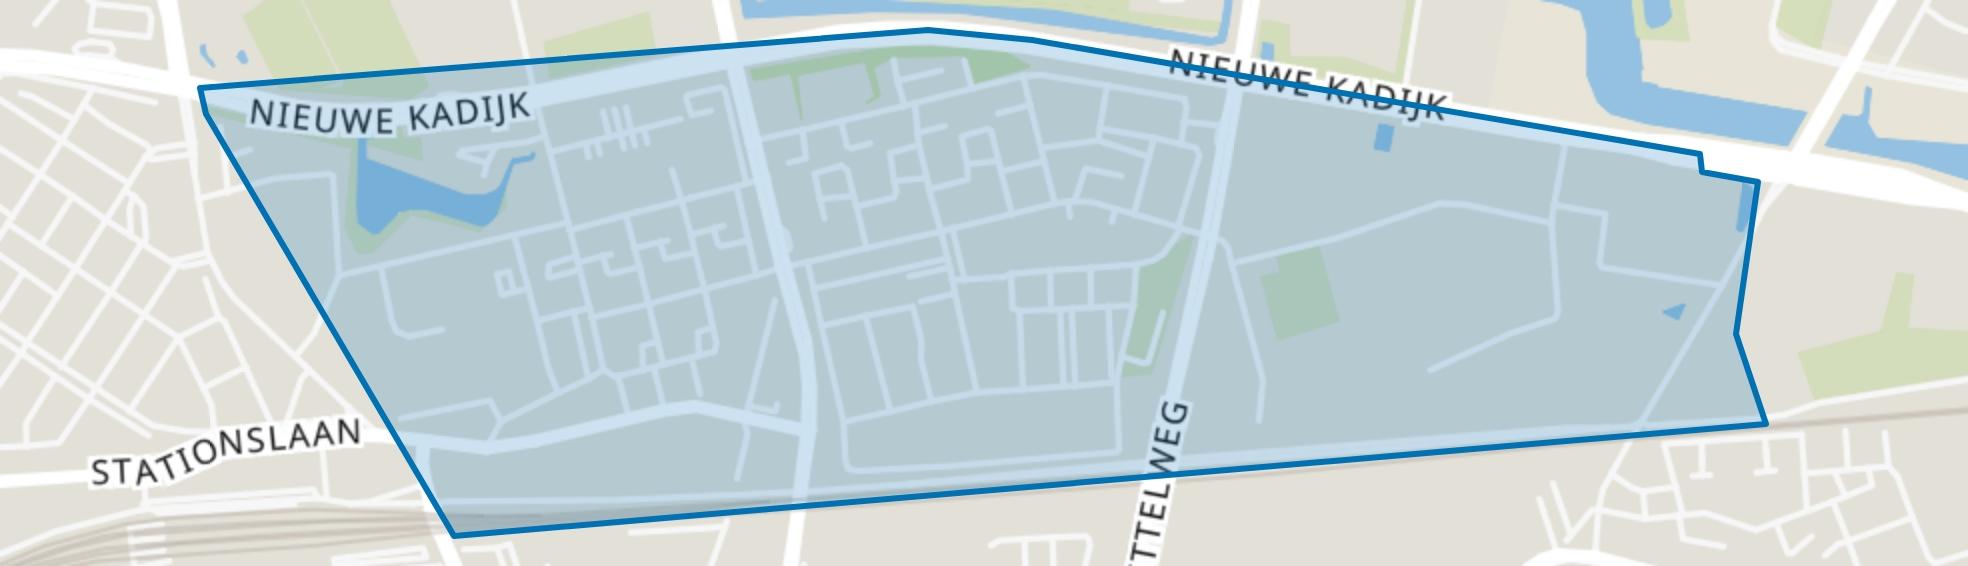 Doornbos-Linie, Breda map